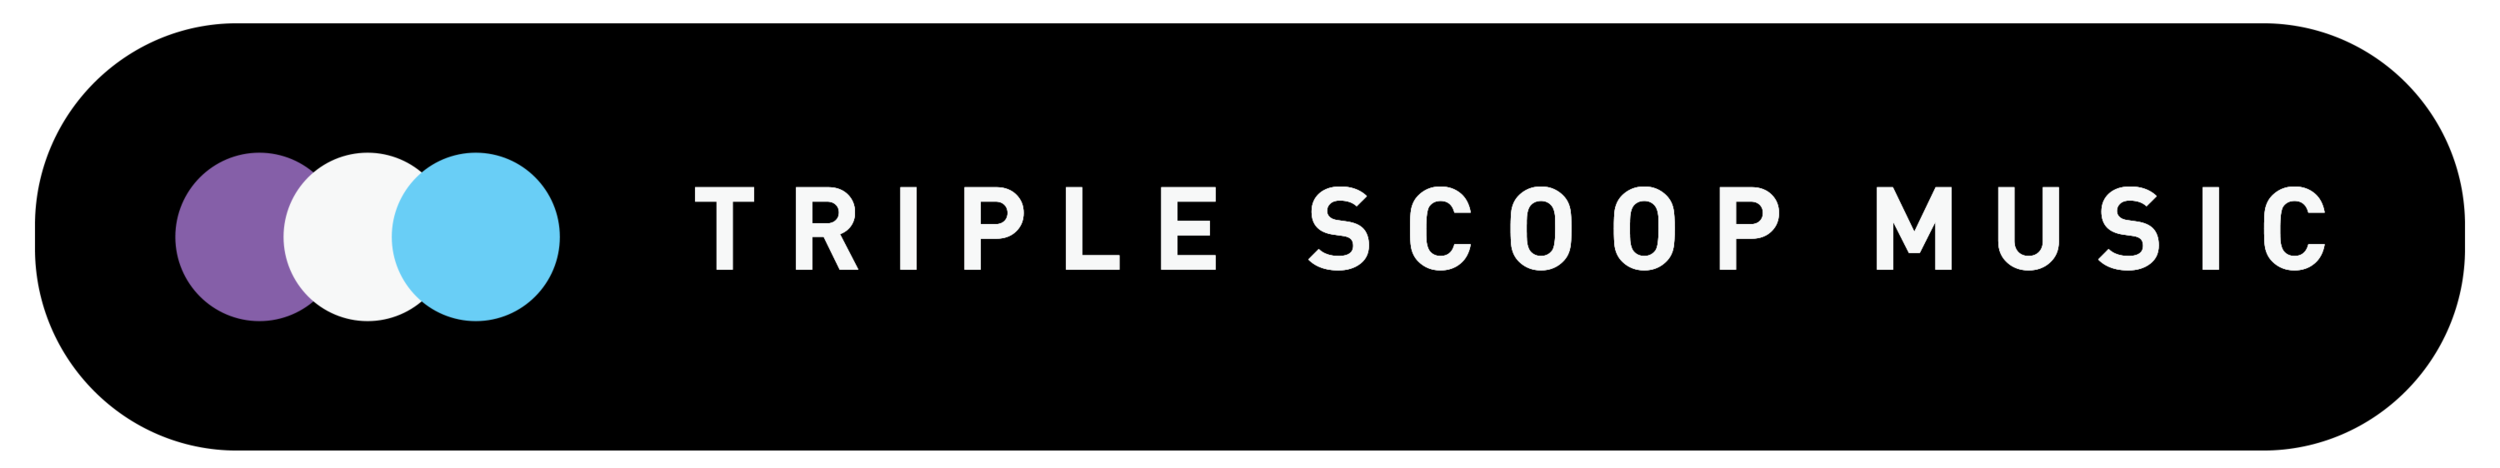 TripleScoopMusic_2016_Logo_blackBG.png